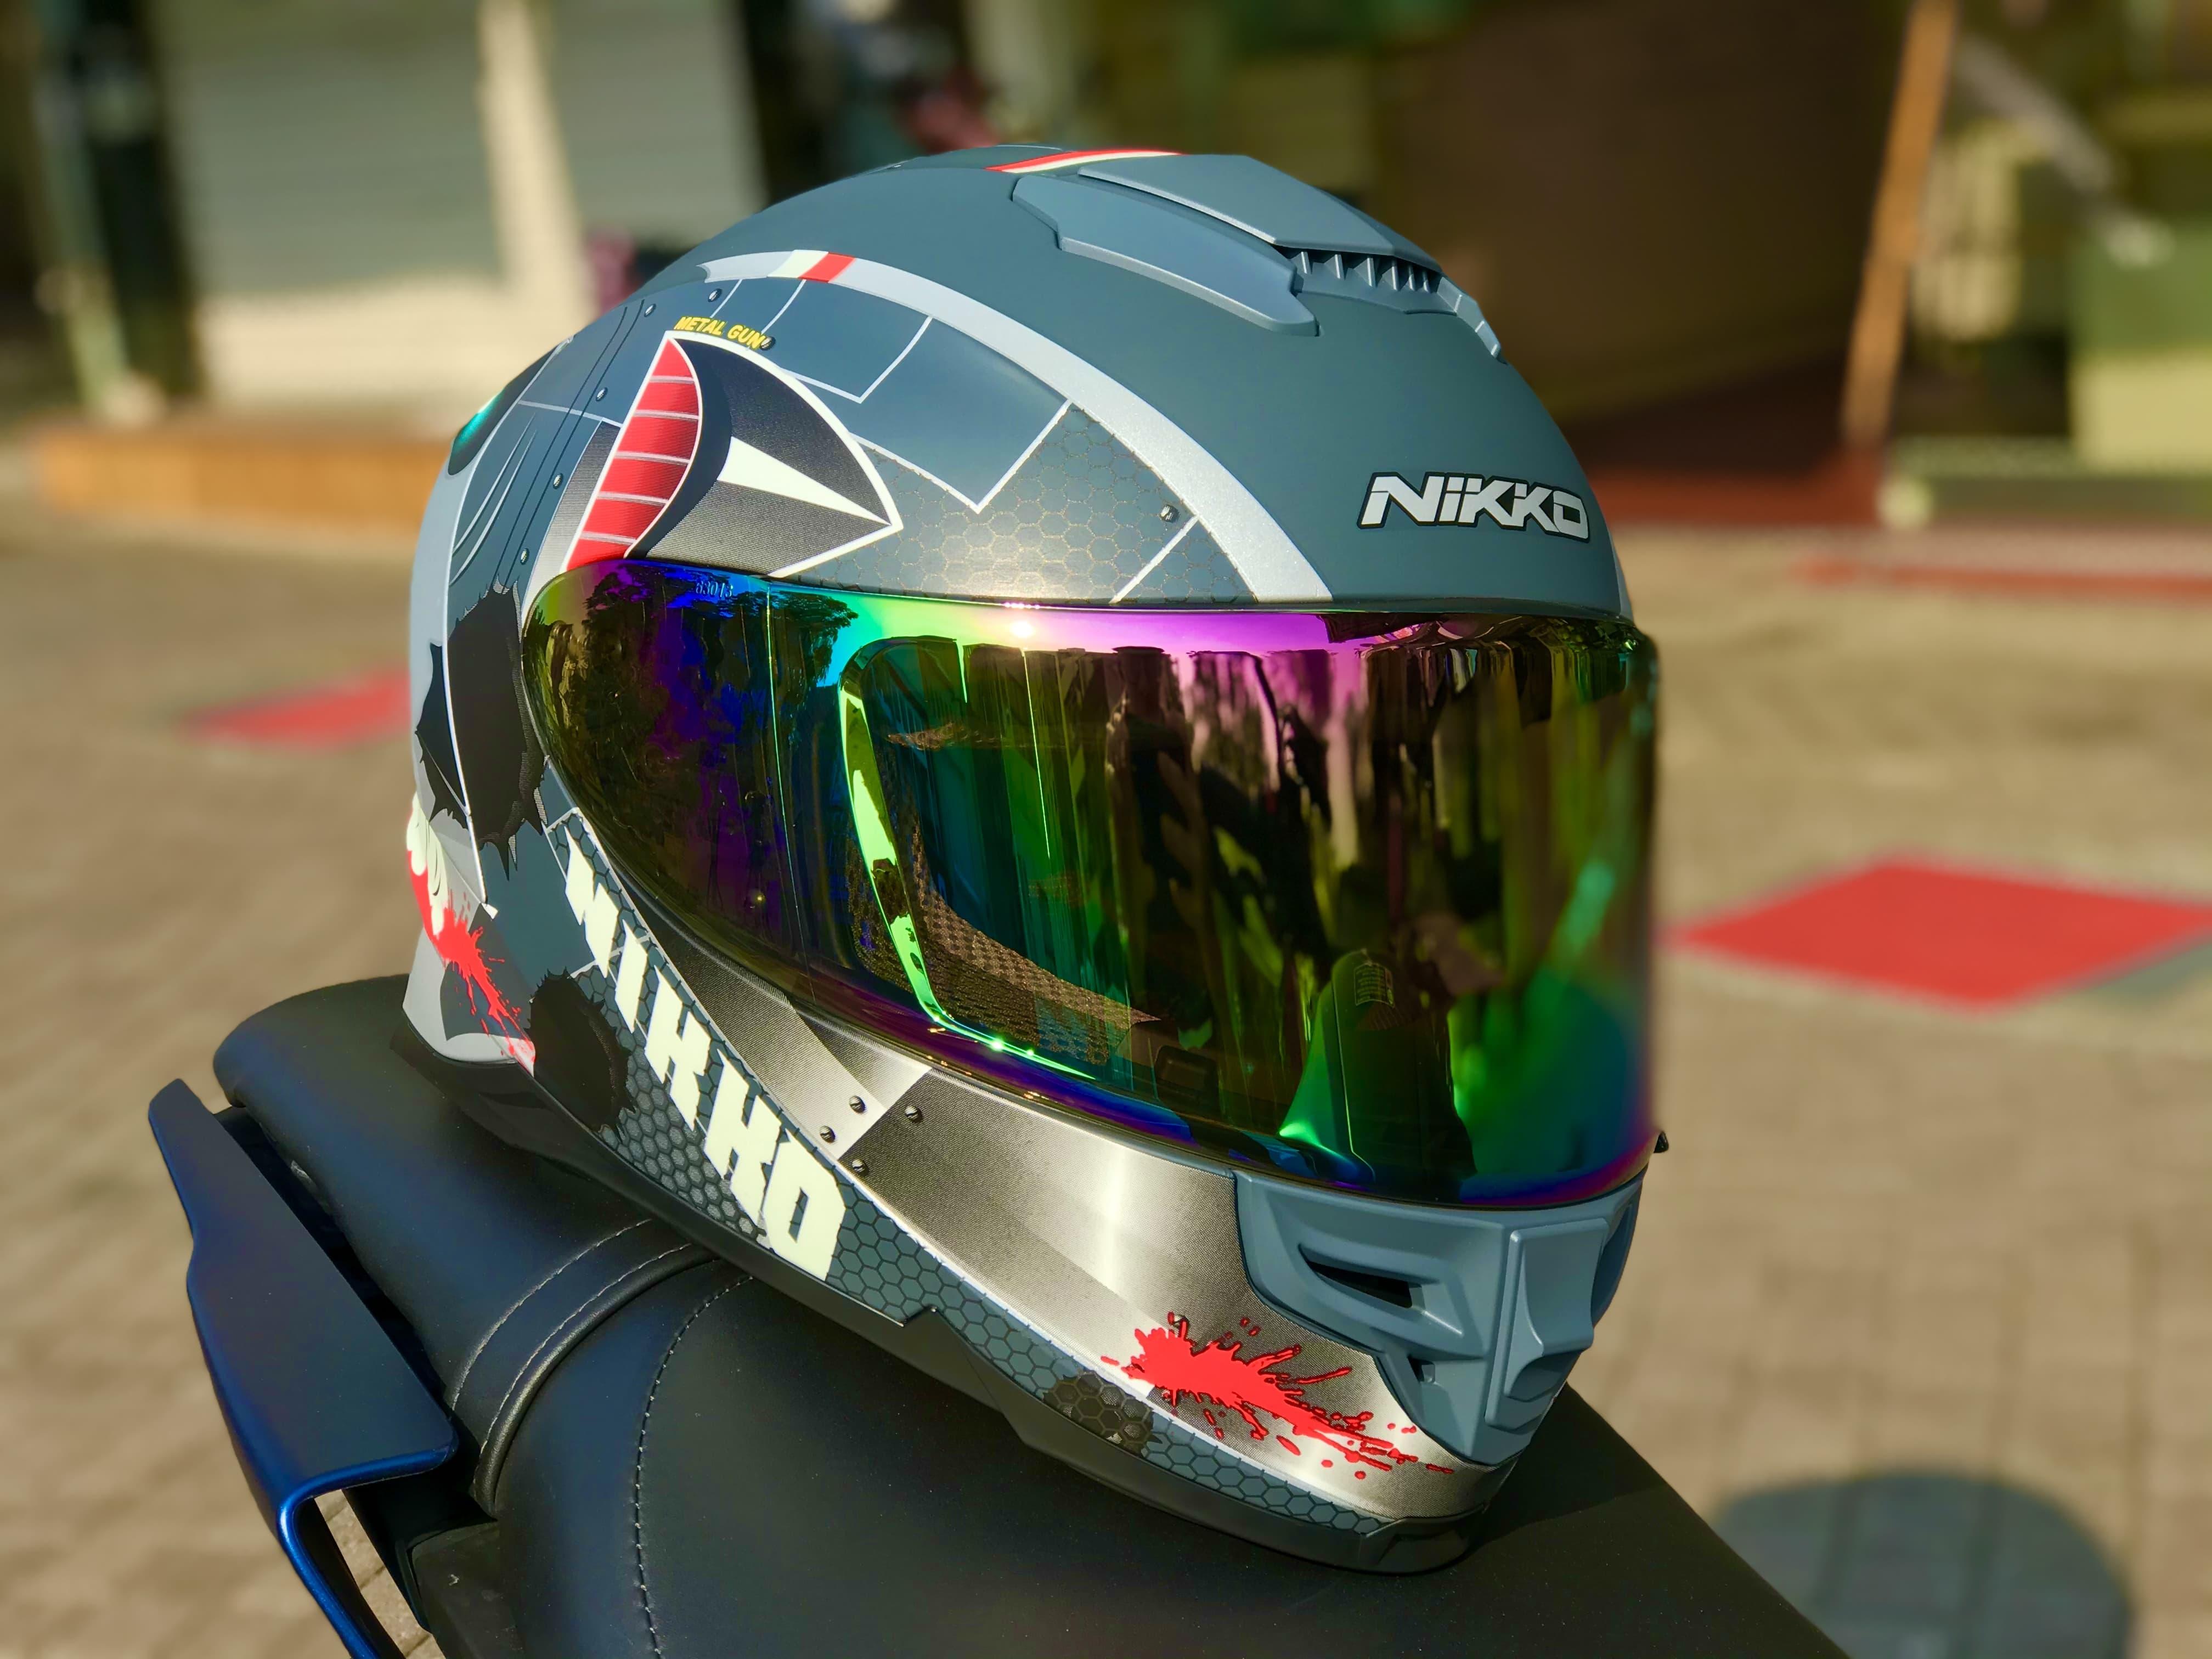 NP HELMET現貨可快速出貨⚡NIKKO N806電鍍片 電五彩 電鍍藍 電鍍鏡片 鏡片